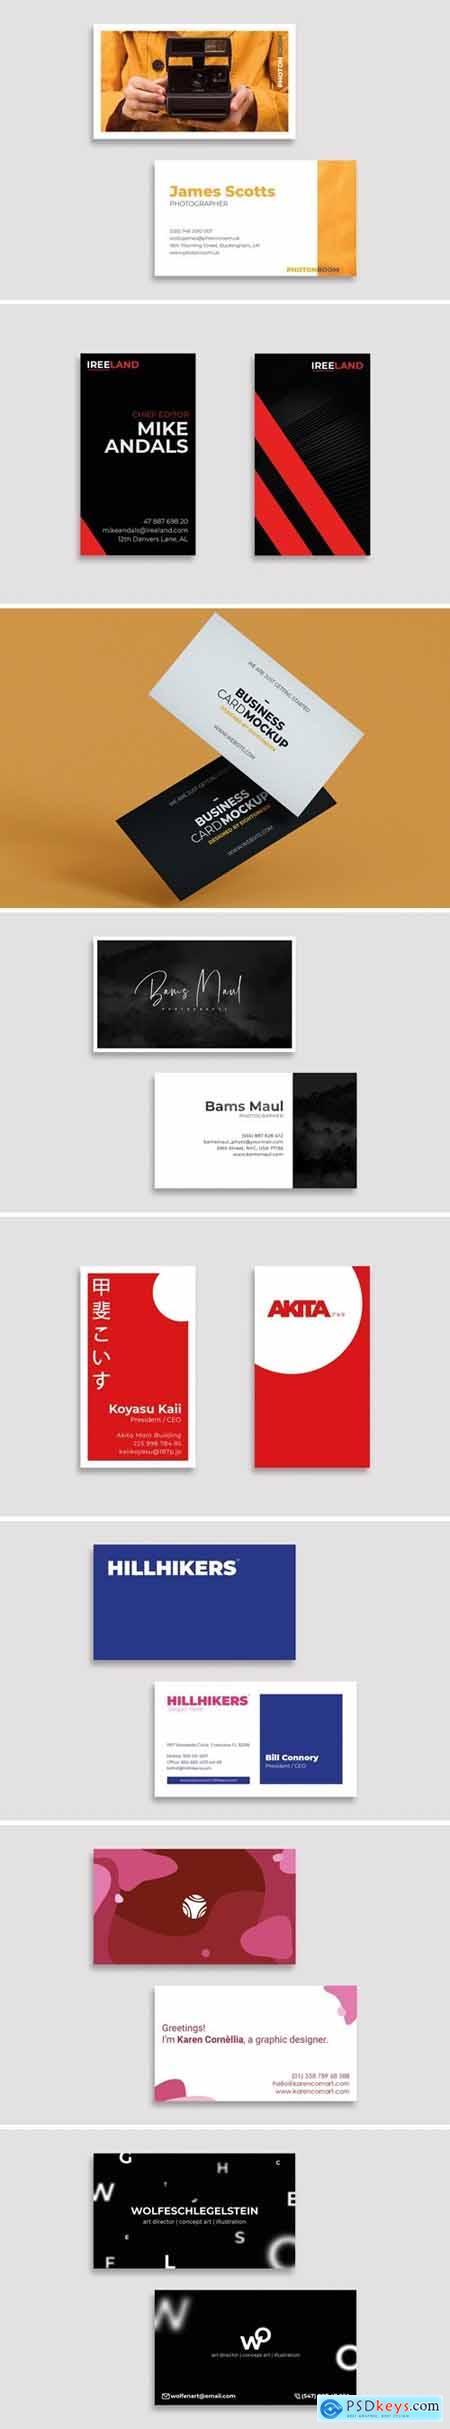 Business Card Design Professional Bundle